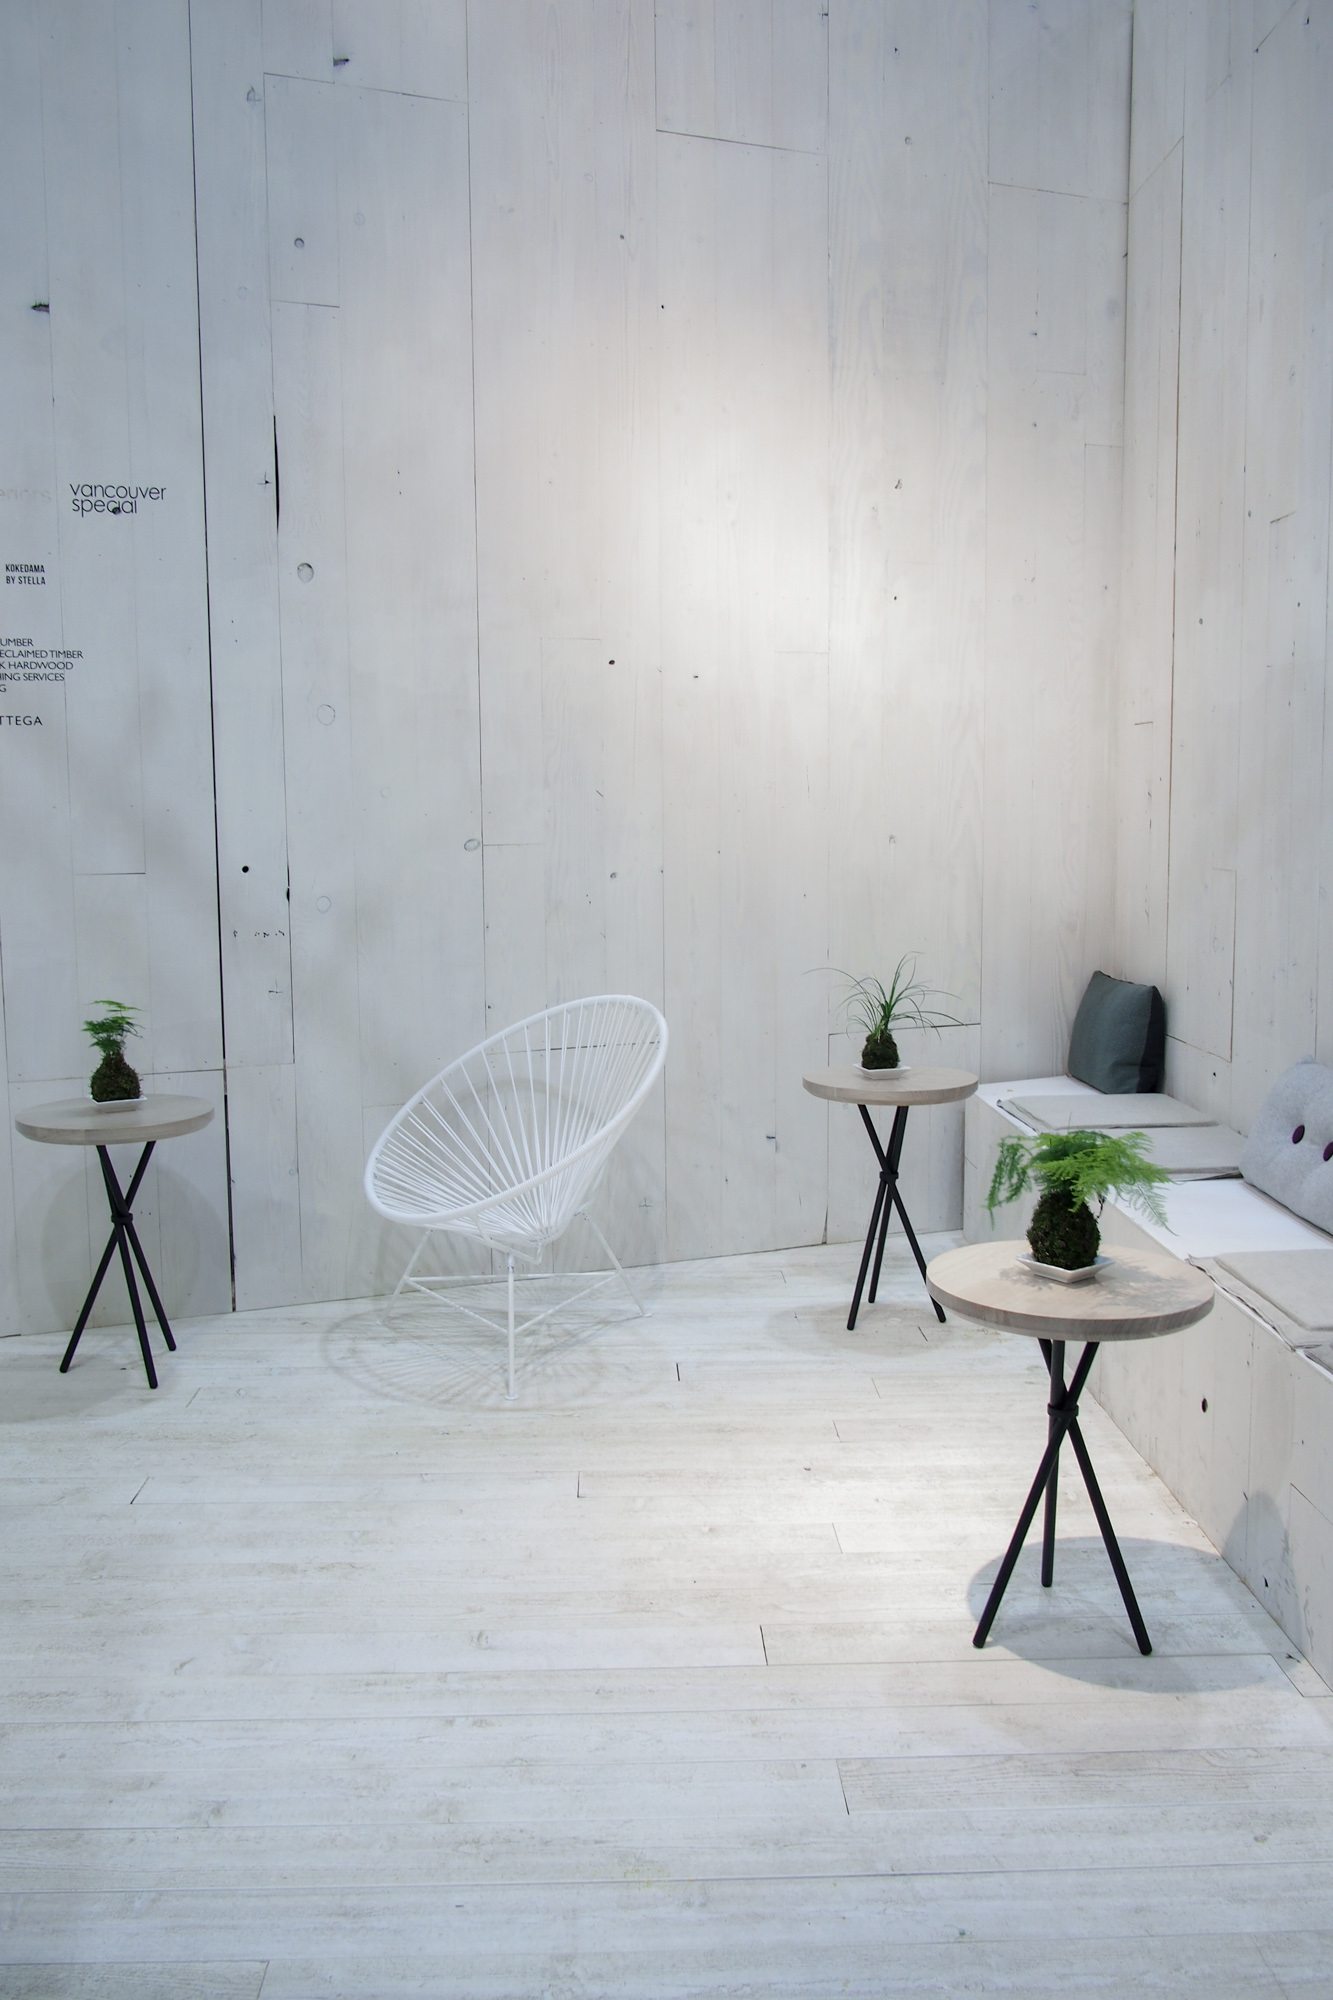 Bottega Vip Lounge-15.jpg